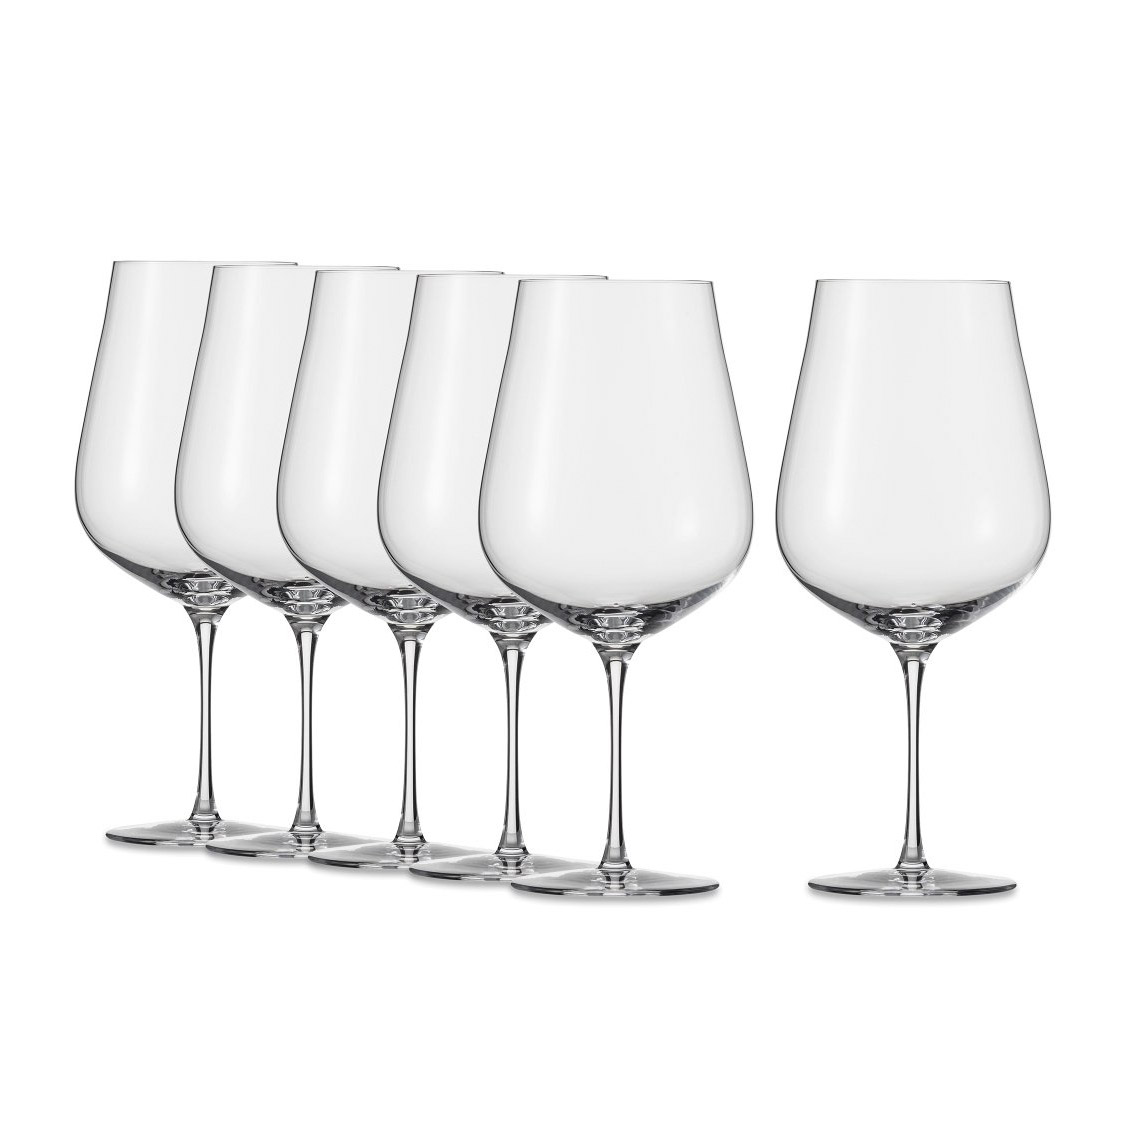 Фото - Набор бокалов для красного вина Schott Zwiesel Air Bordeaux 827 мл 6 шт набор бокалов для красного вина schott zwiesel prizma 561 мл 6 шт